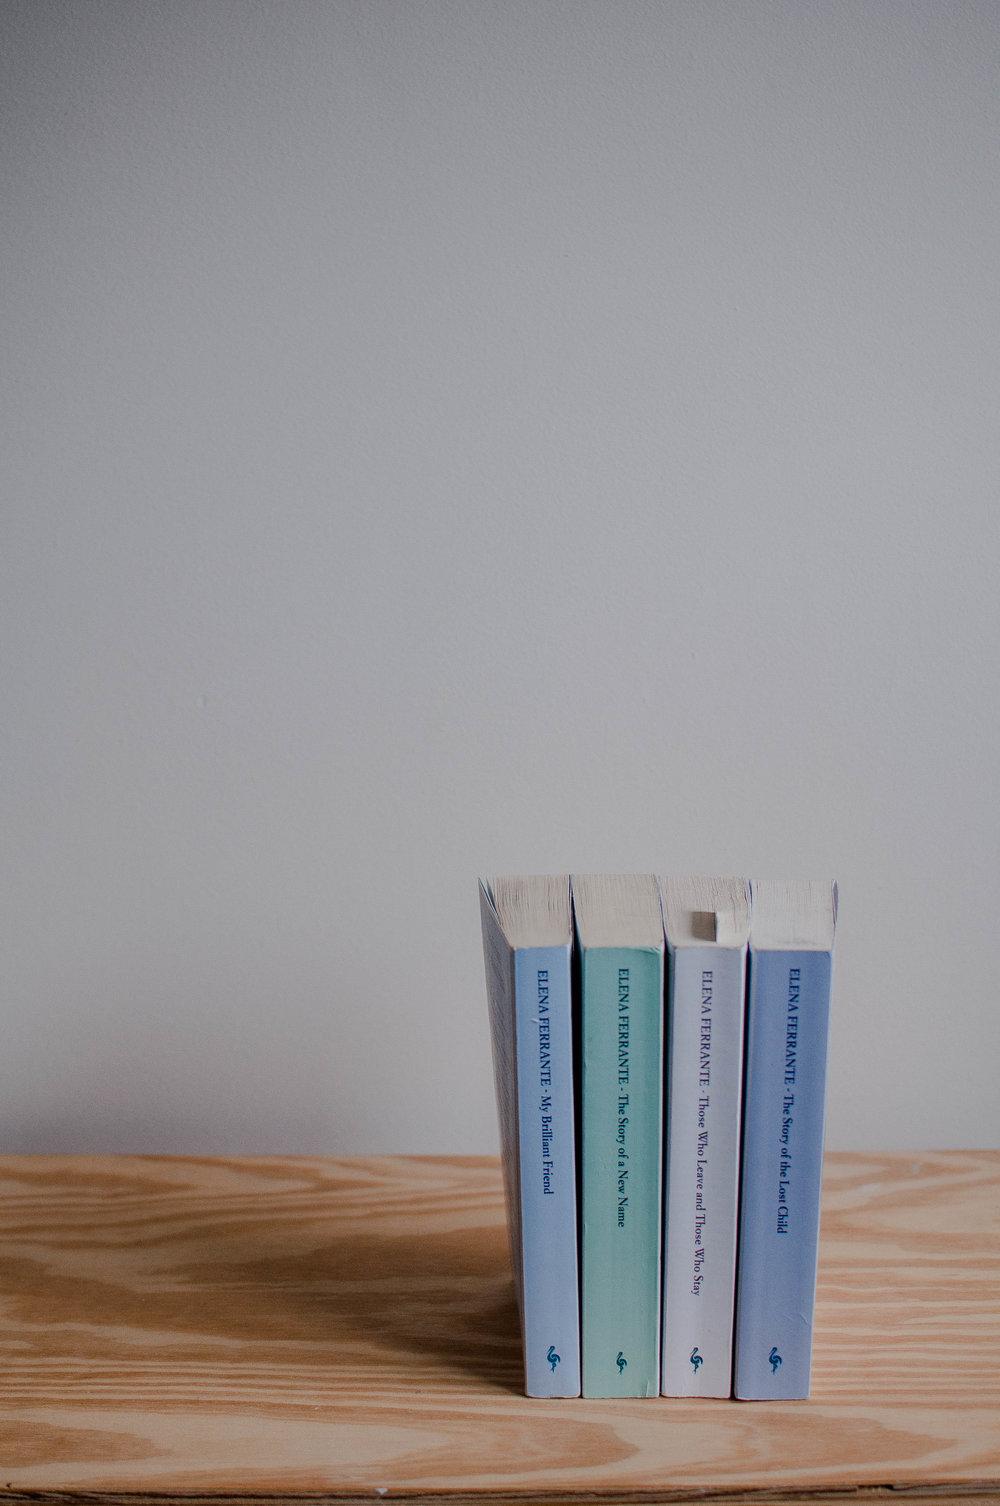 The Neapolitan Novels, Elena Ferrante